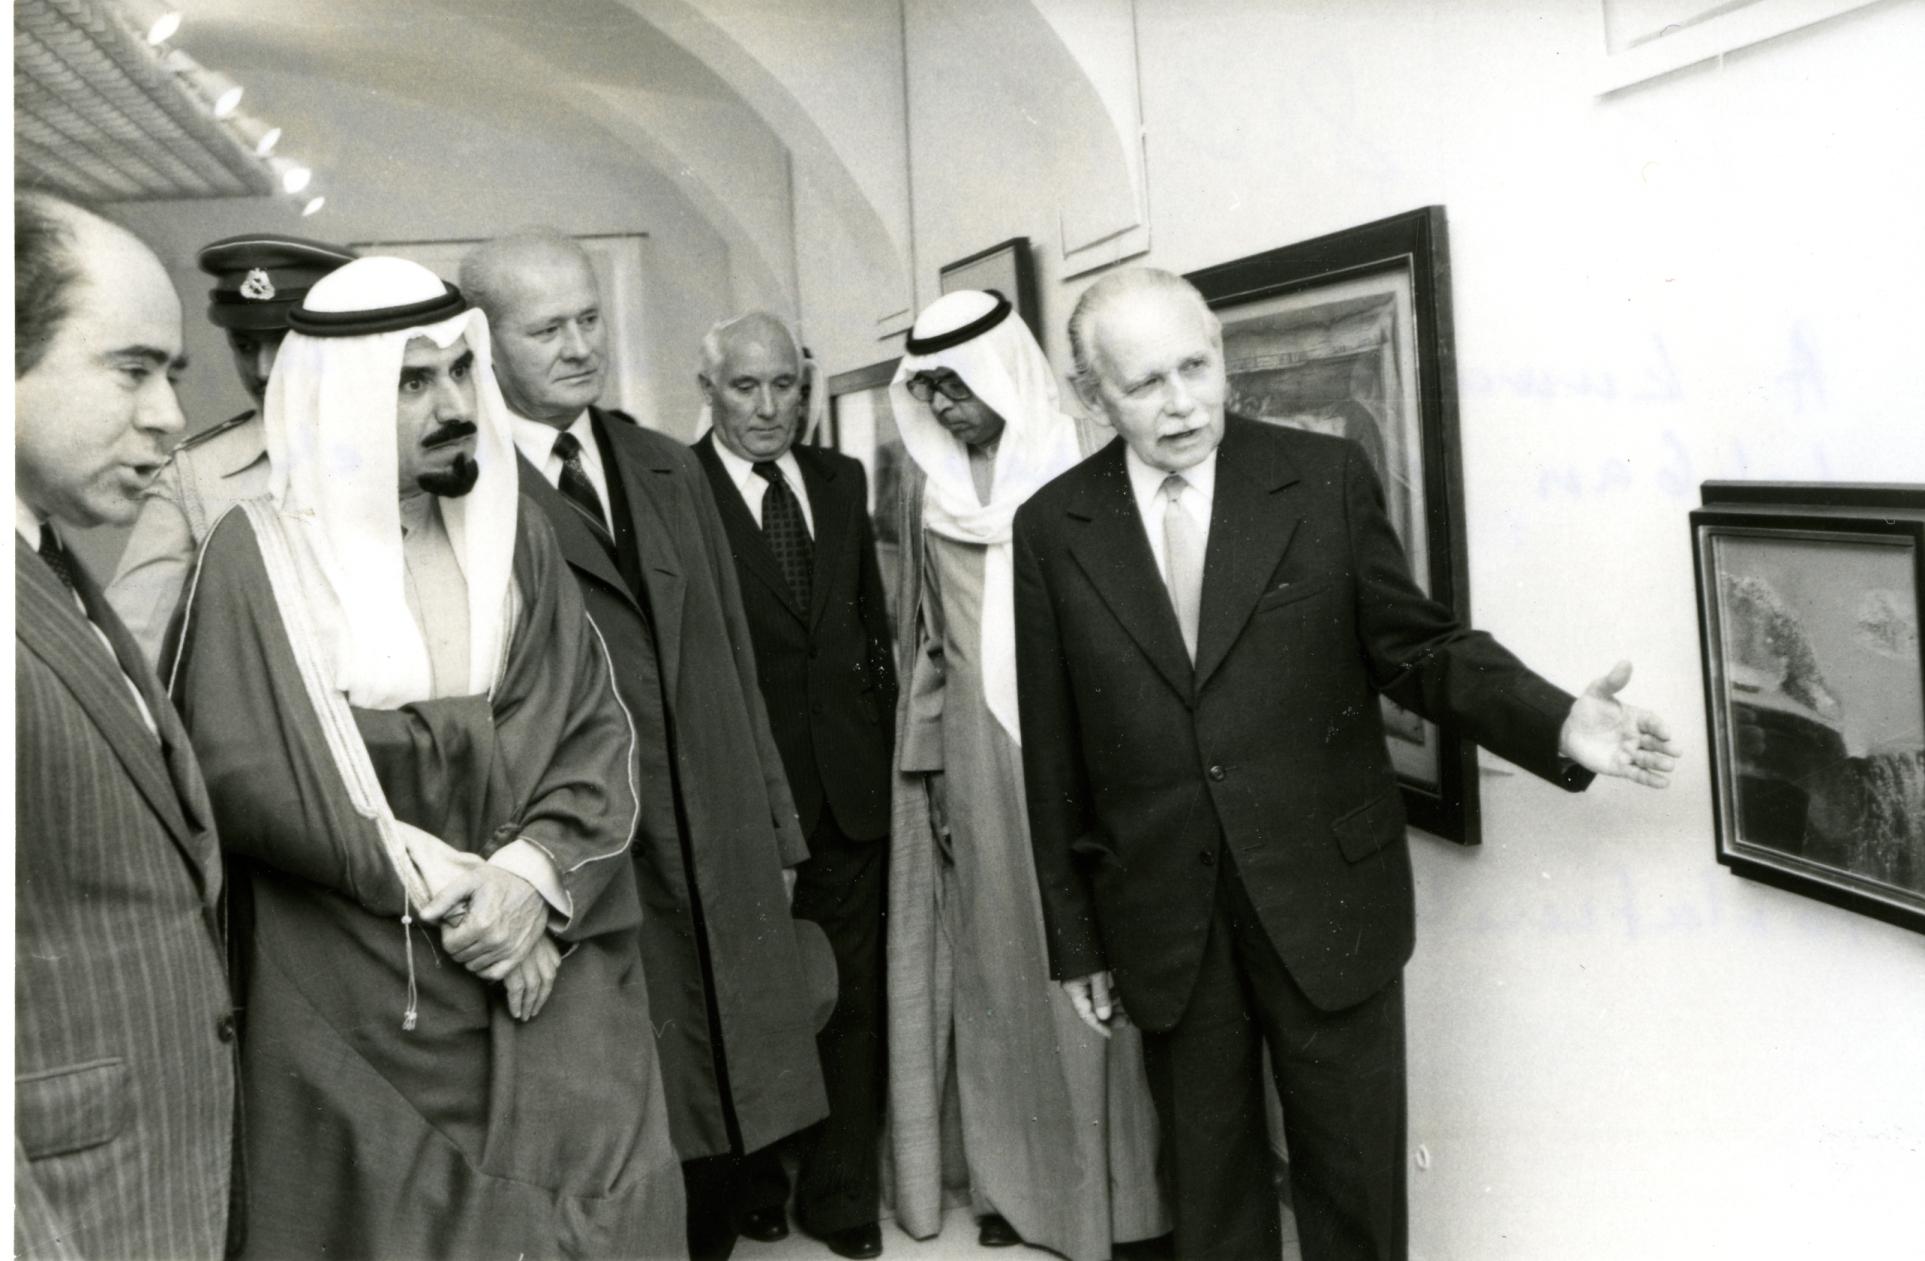 kuvaiti_emir_a_keptarban_82.9.15._85.101.1.jpg